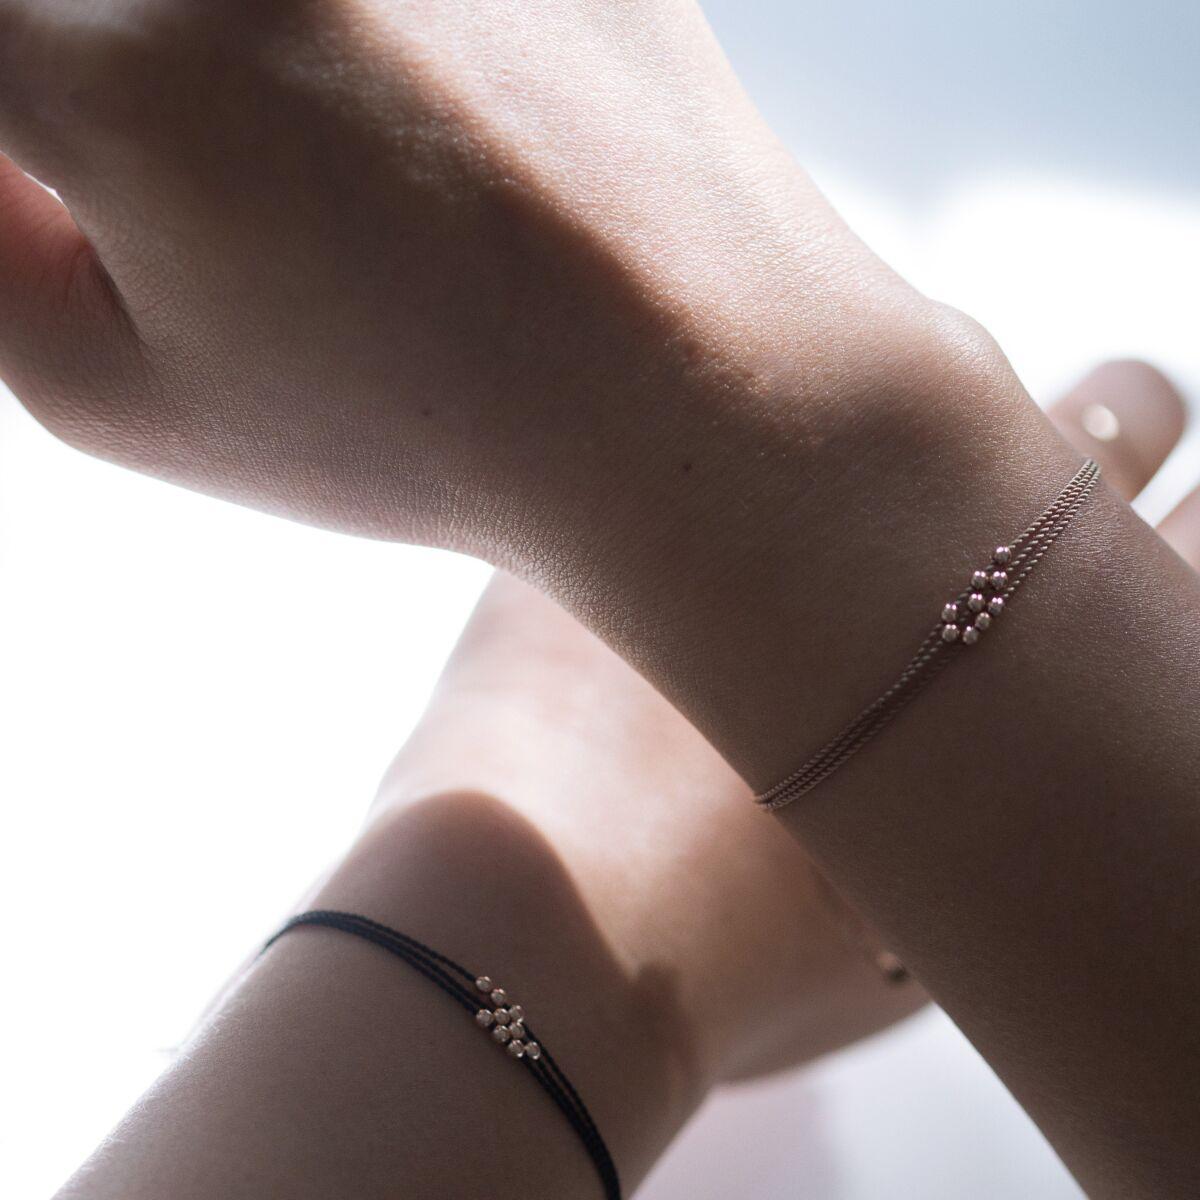 Friendship Bracelet with Rose Gold Beads, Black image